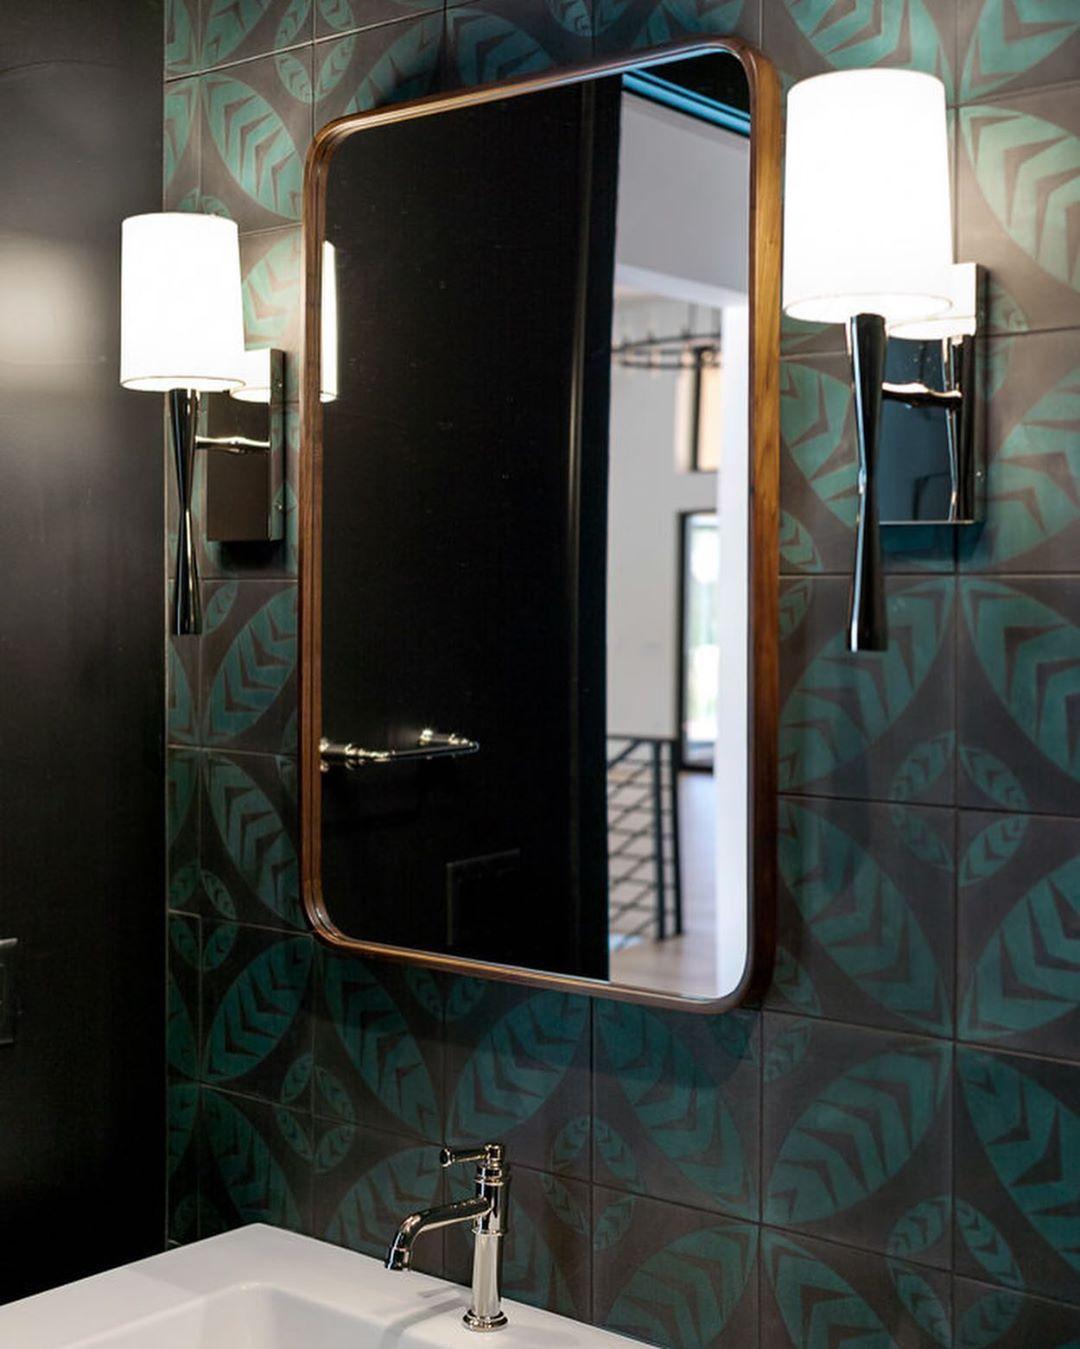 Bathroom with leaf tiles